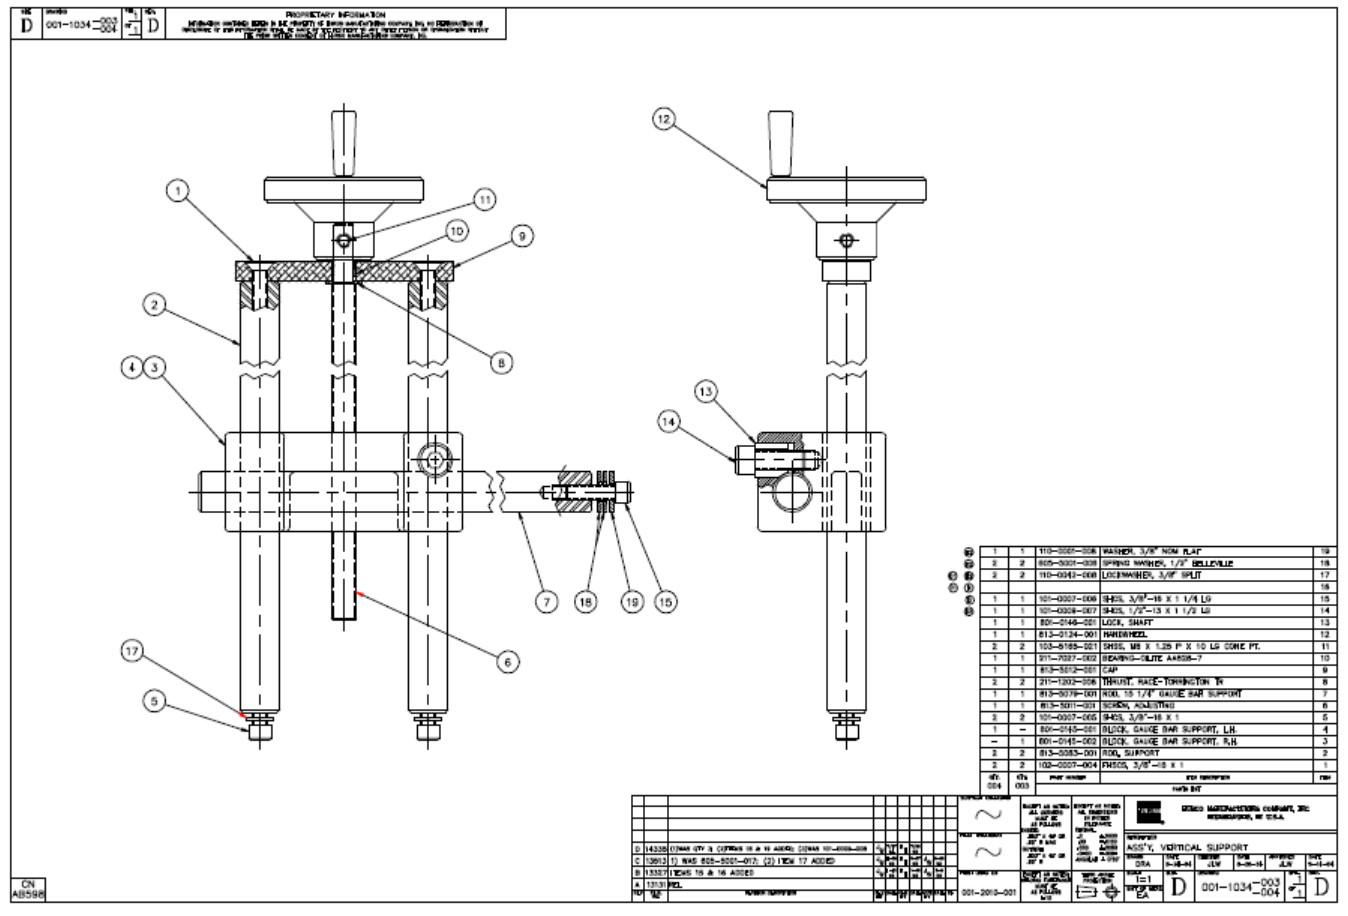 Wiring Keep This Forum Independent 65 Mustang Fog Light Wiring Diagram